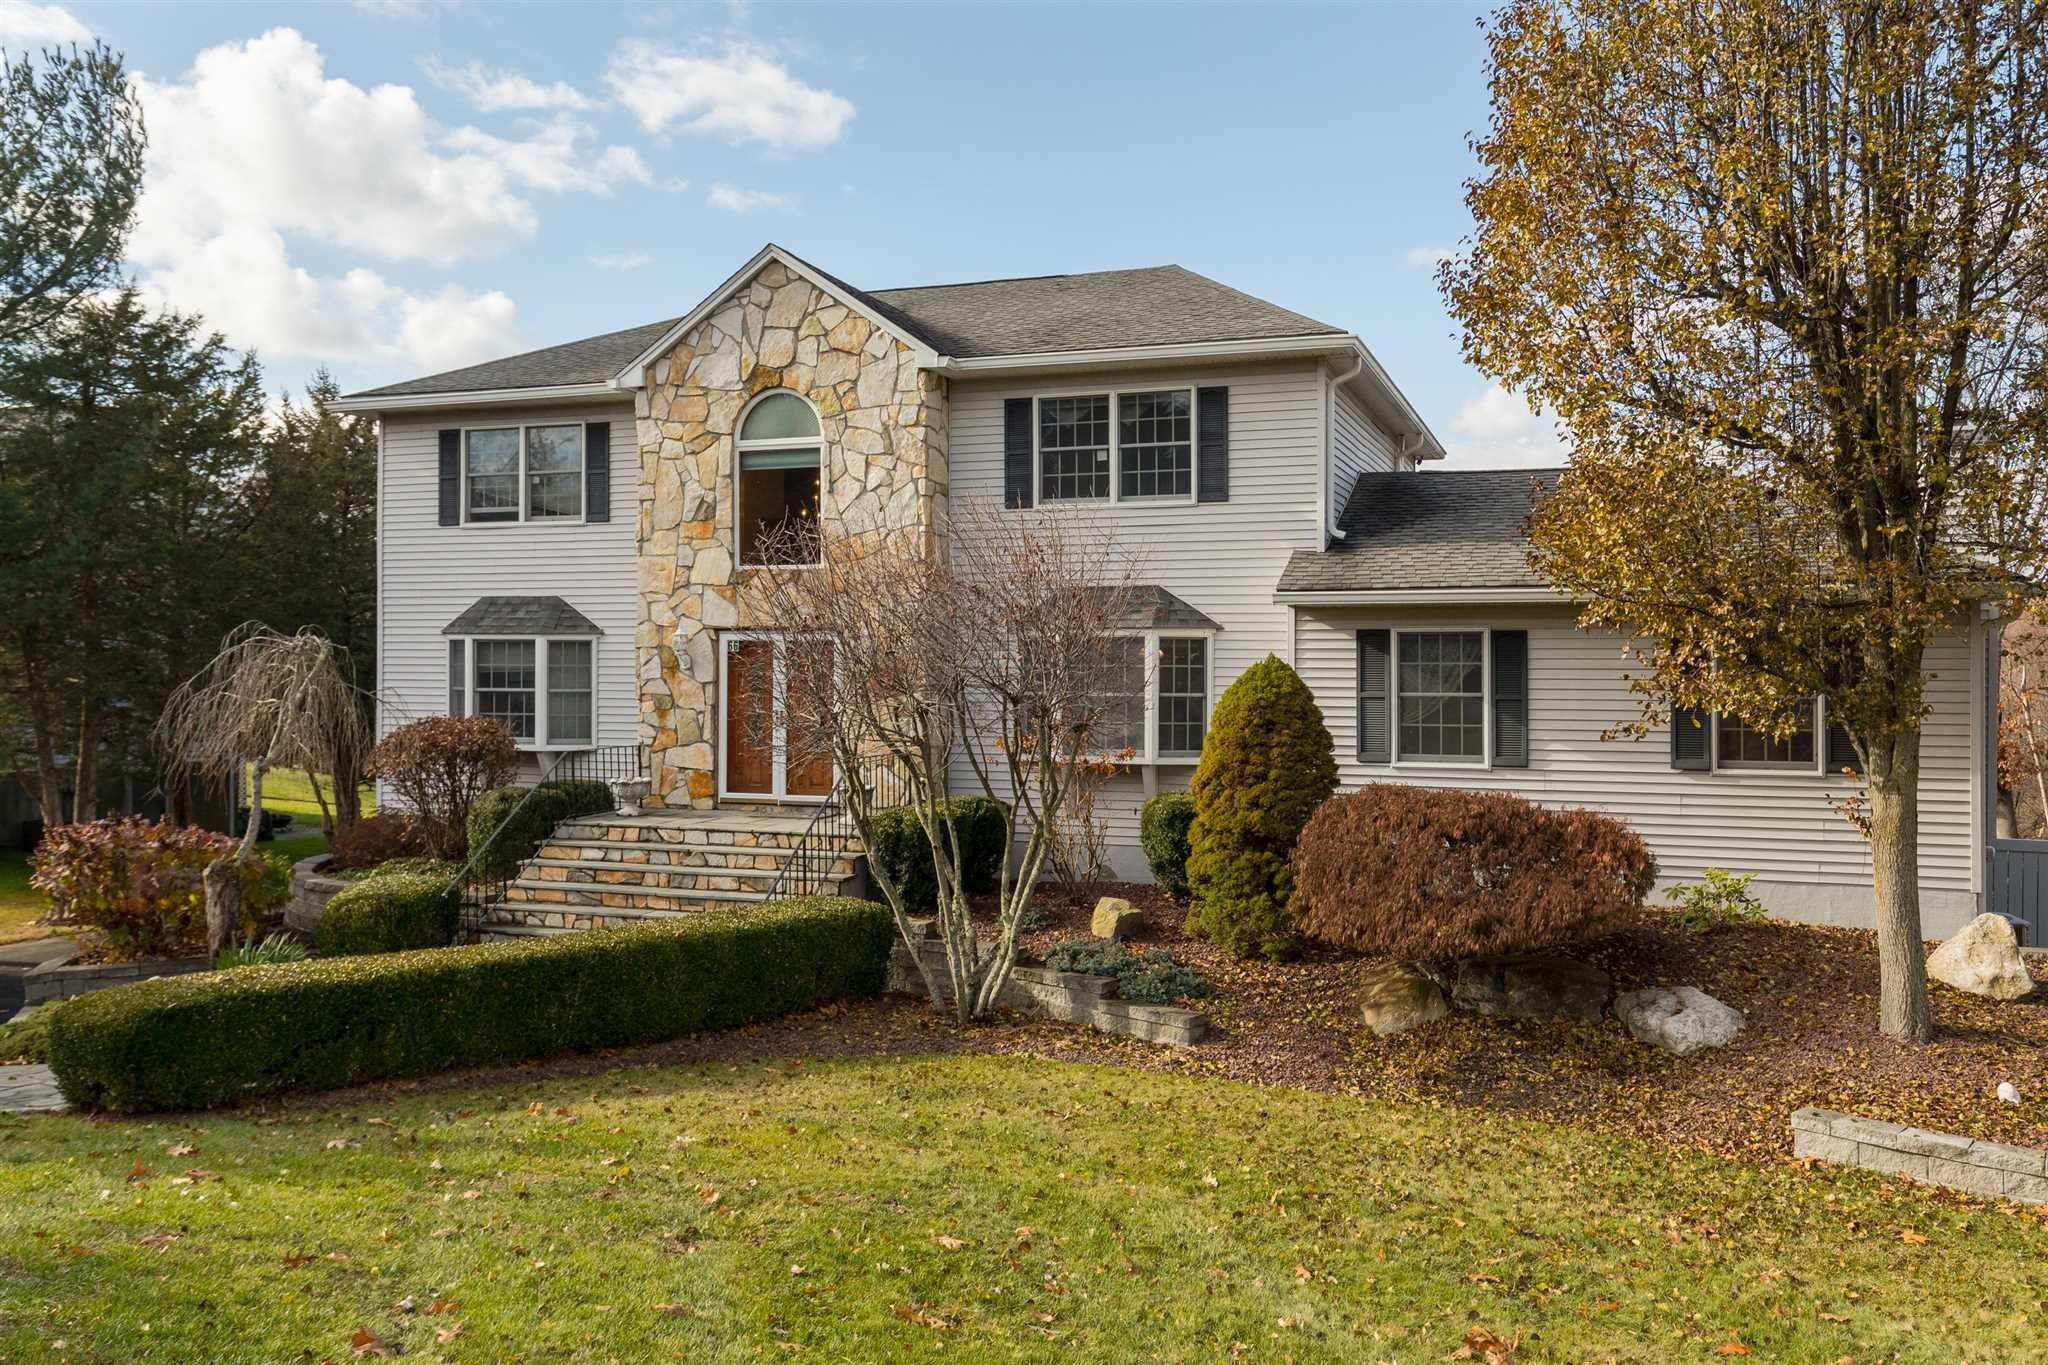 Single Family Home for Sale at 66 SADDLE RIDGE Drive 66 SADDLE RIDGE Drive East Fishkill, New York 12533 United States